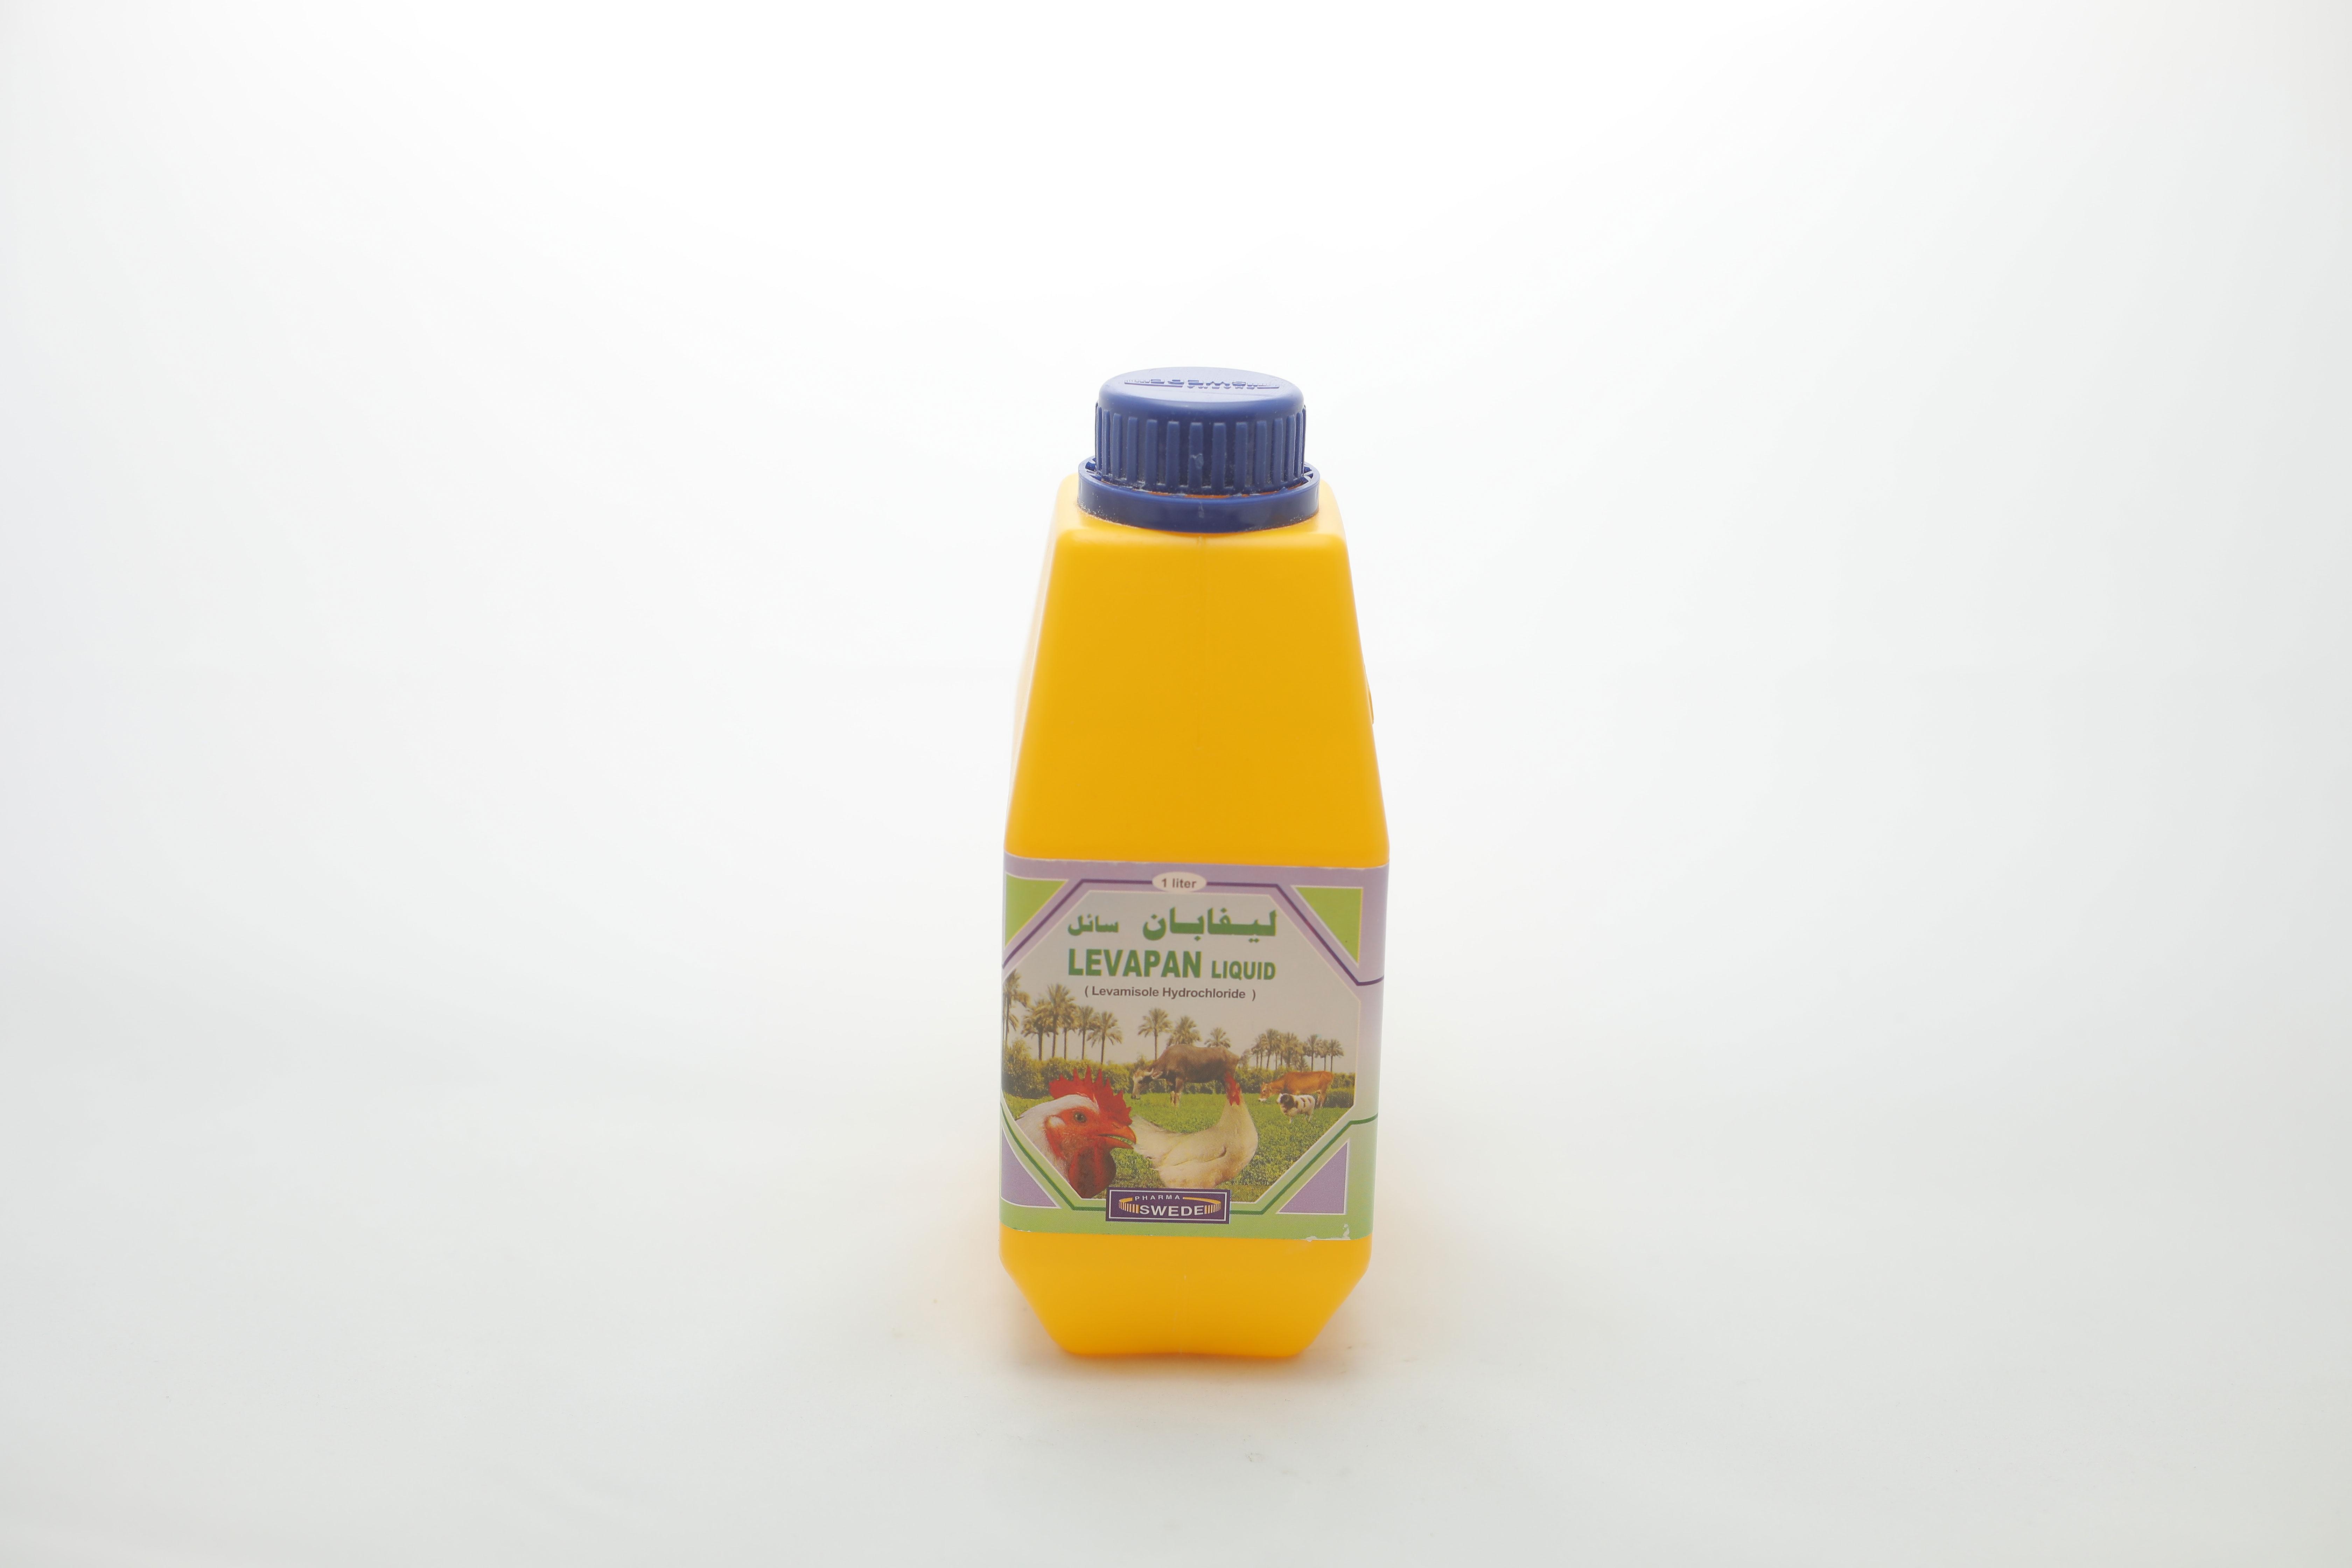 Levapan liquid